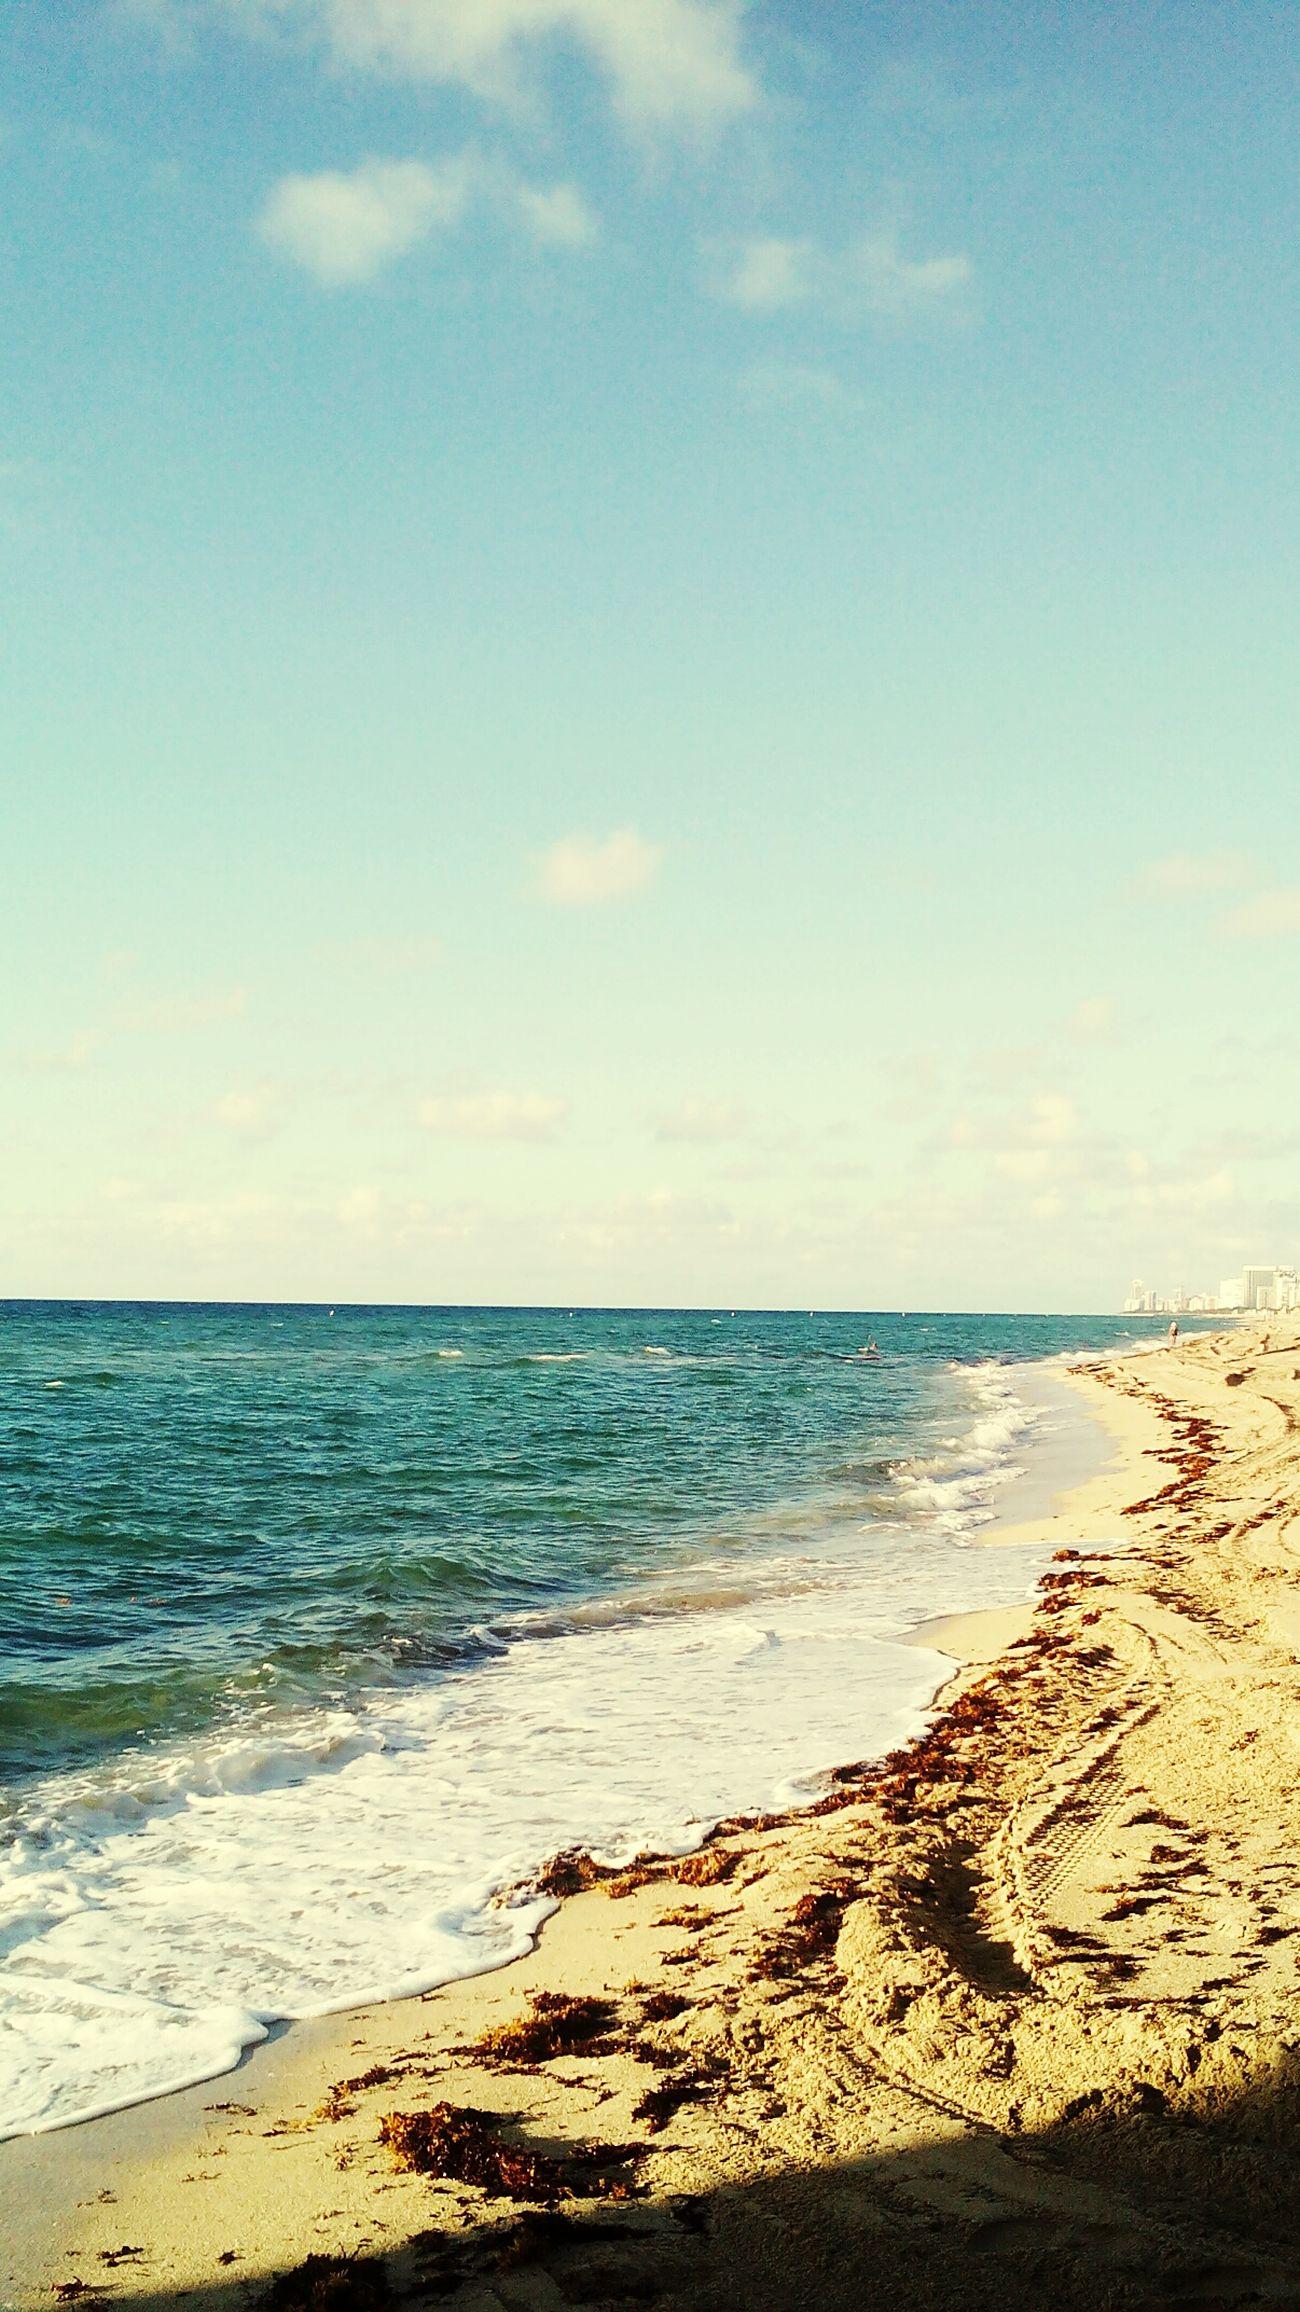 Beachphotography Waterscape Shoreline